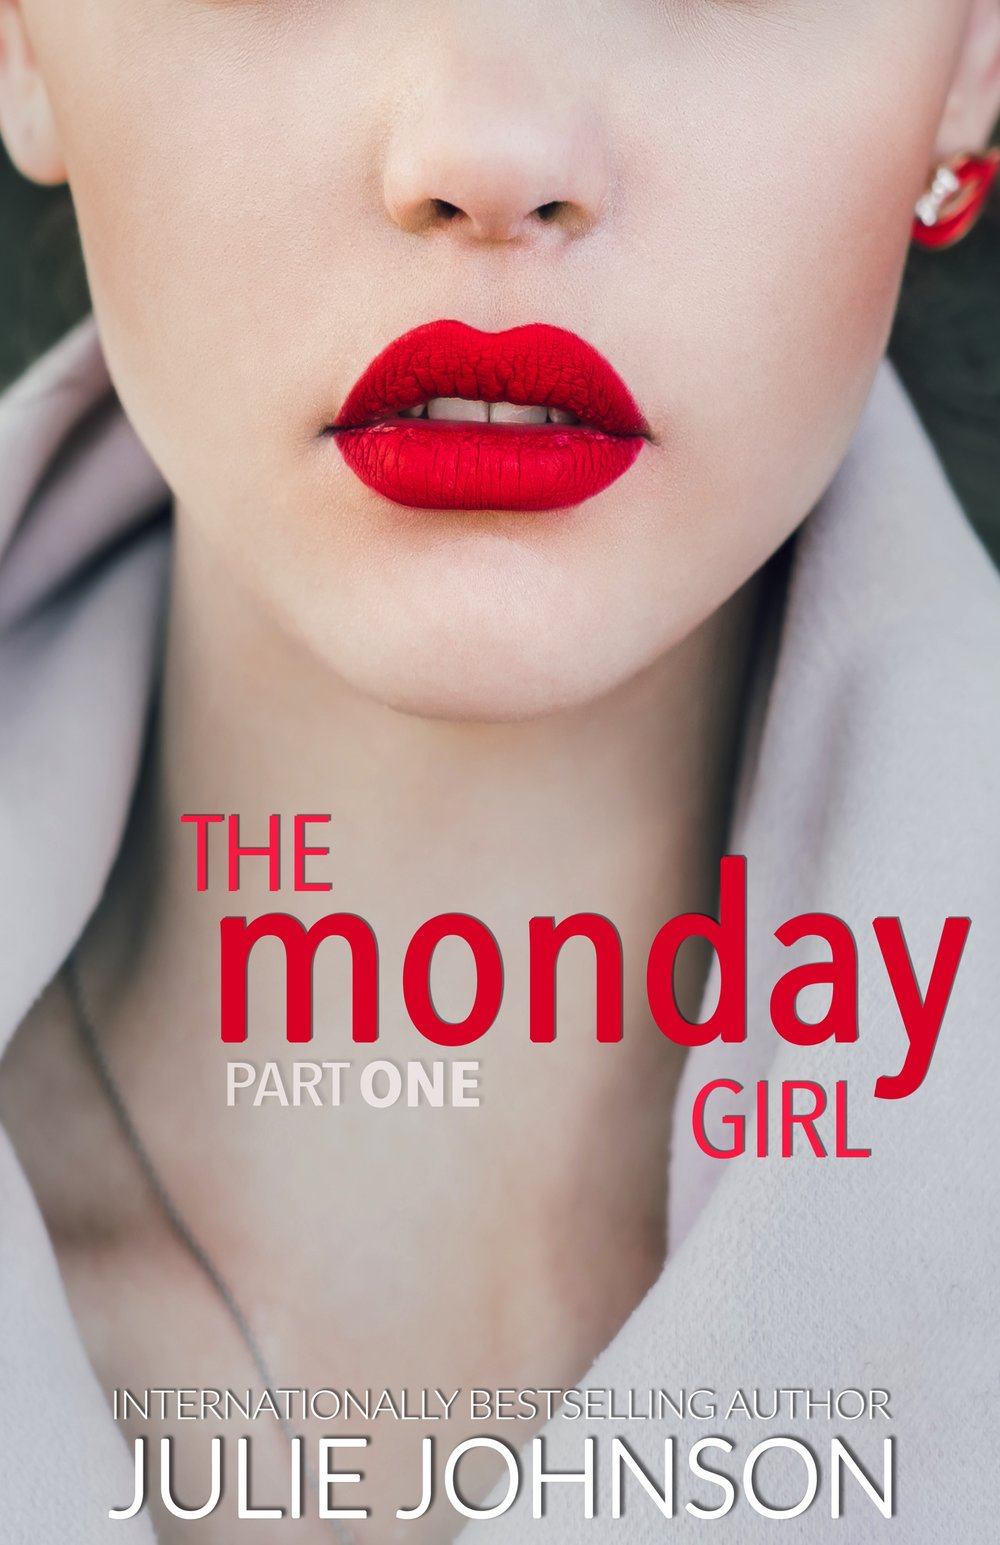 THE-MONDAY-GIRL-Kindle.jpg